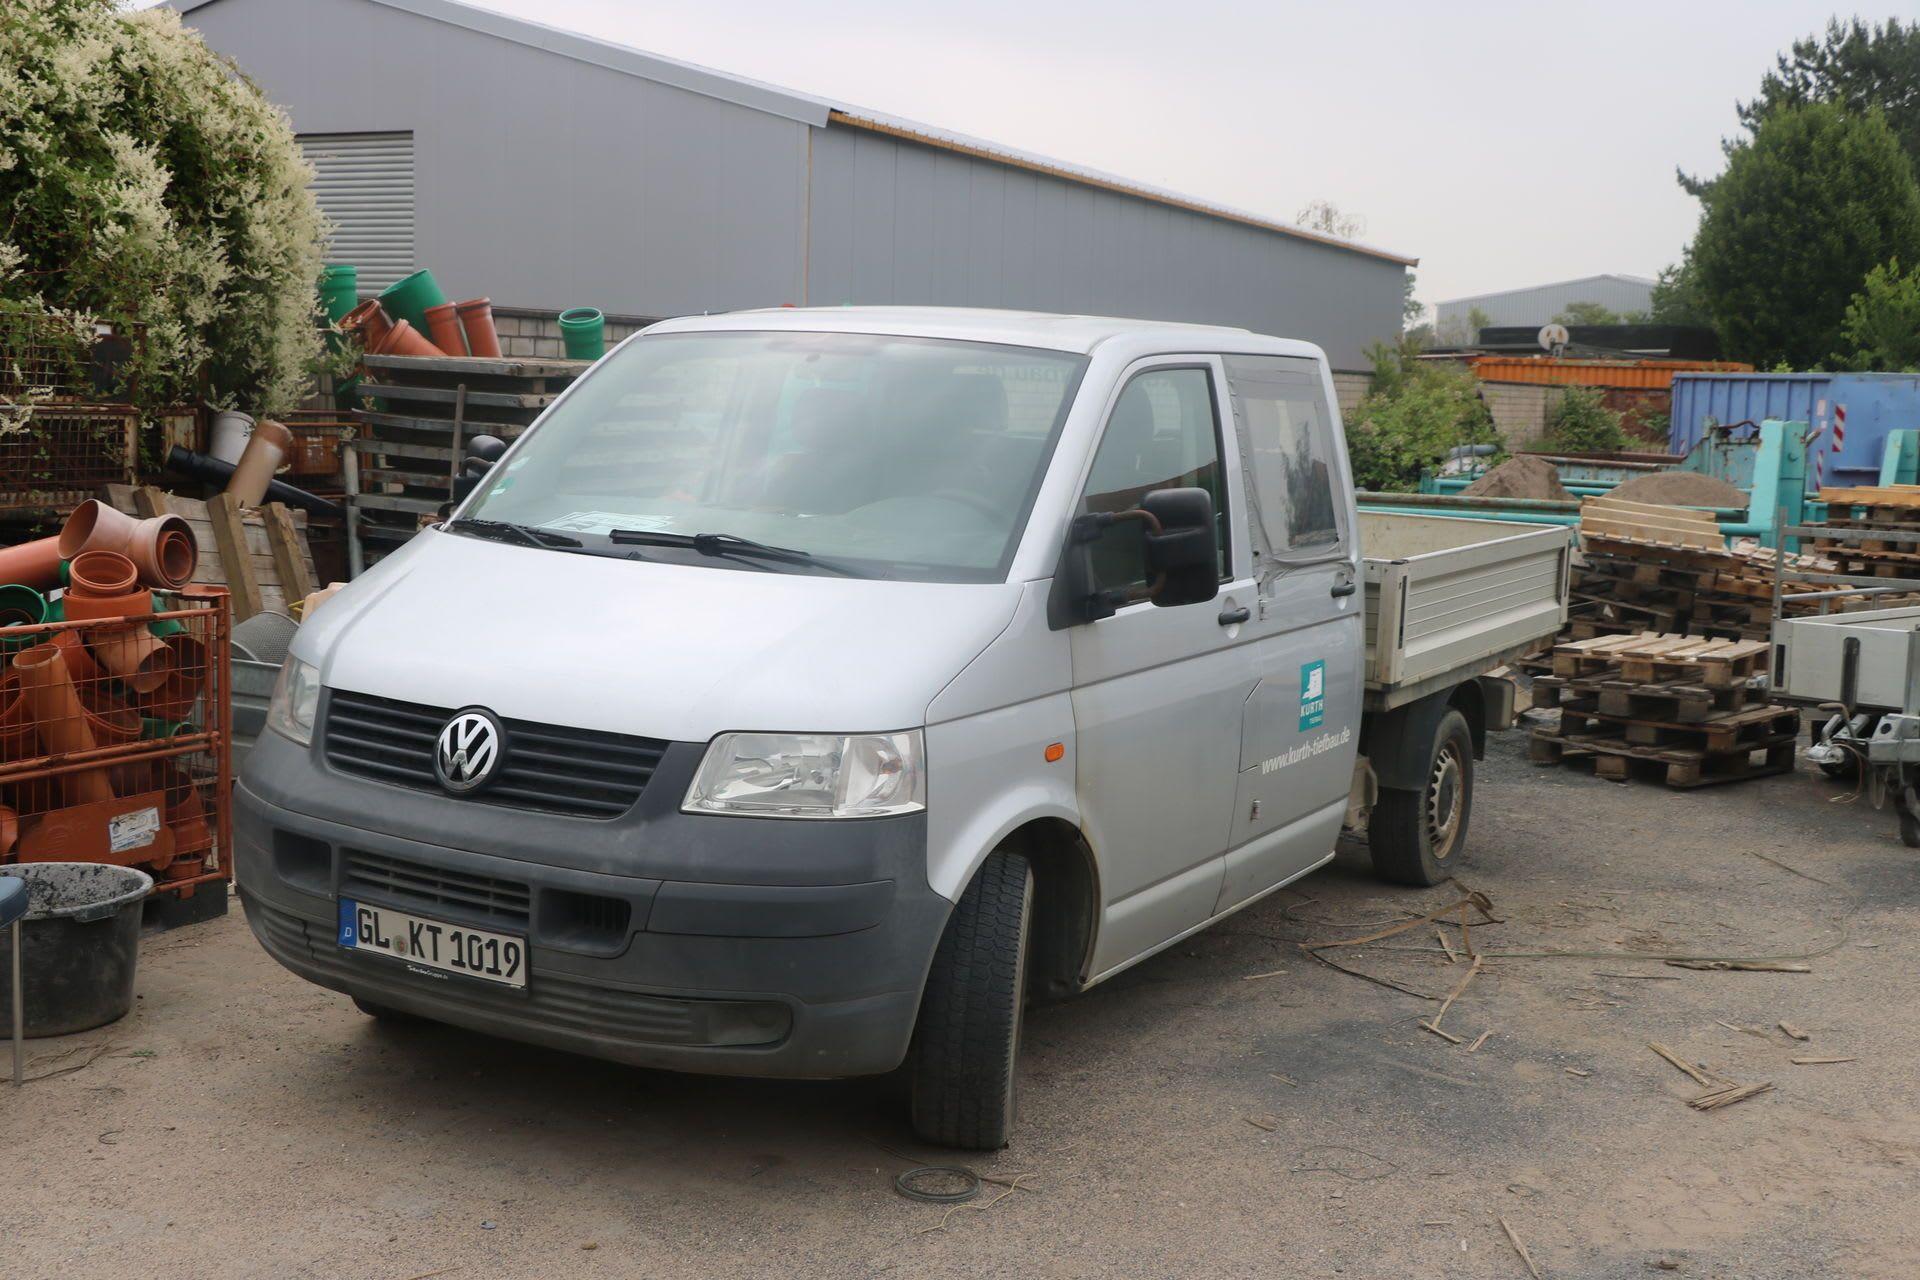 VW T 5 Transporter